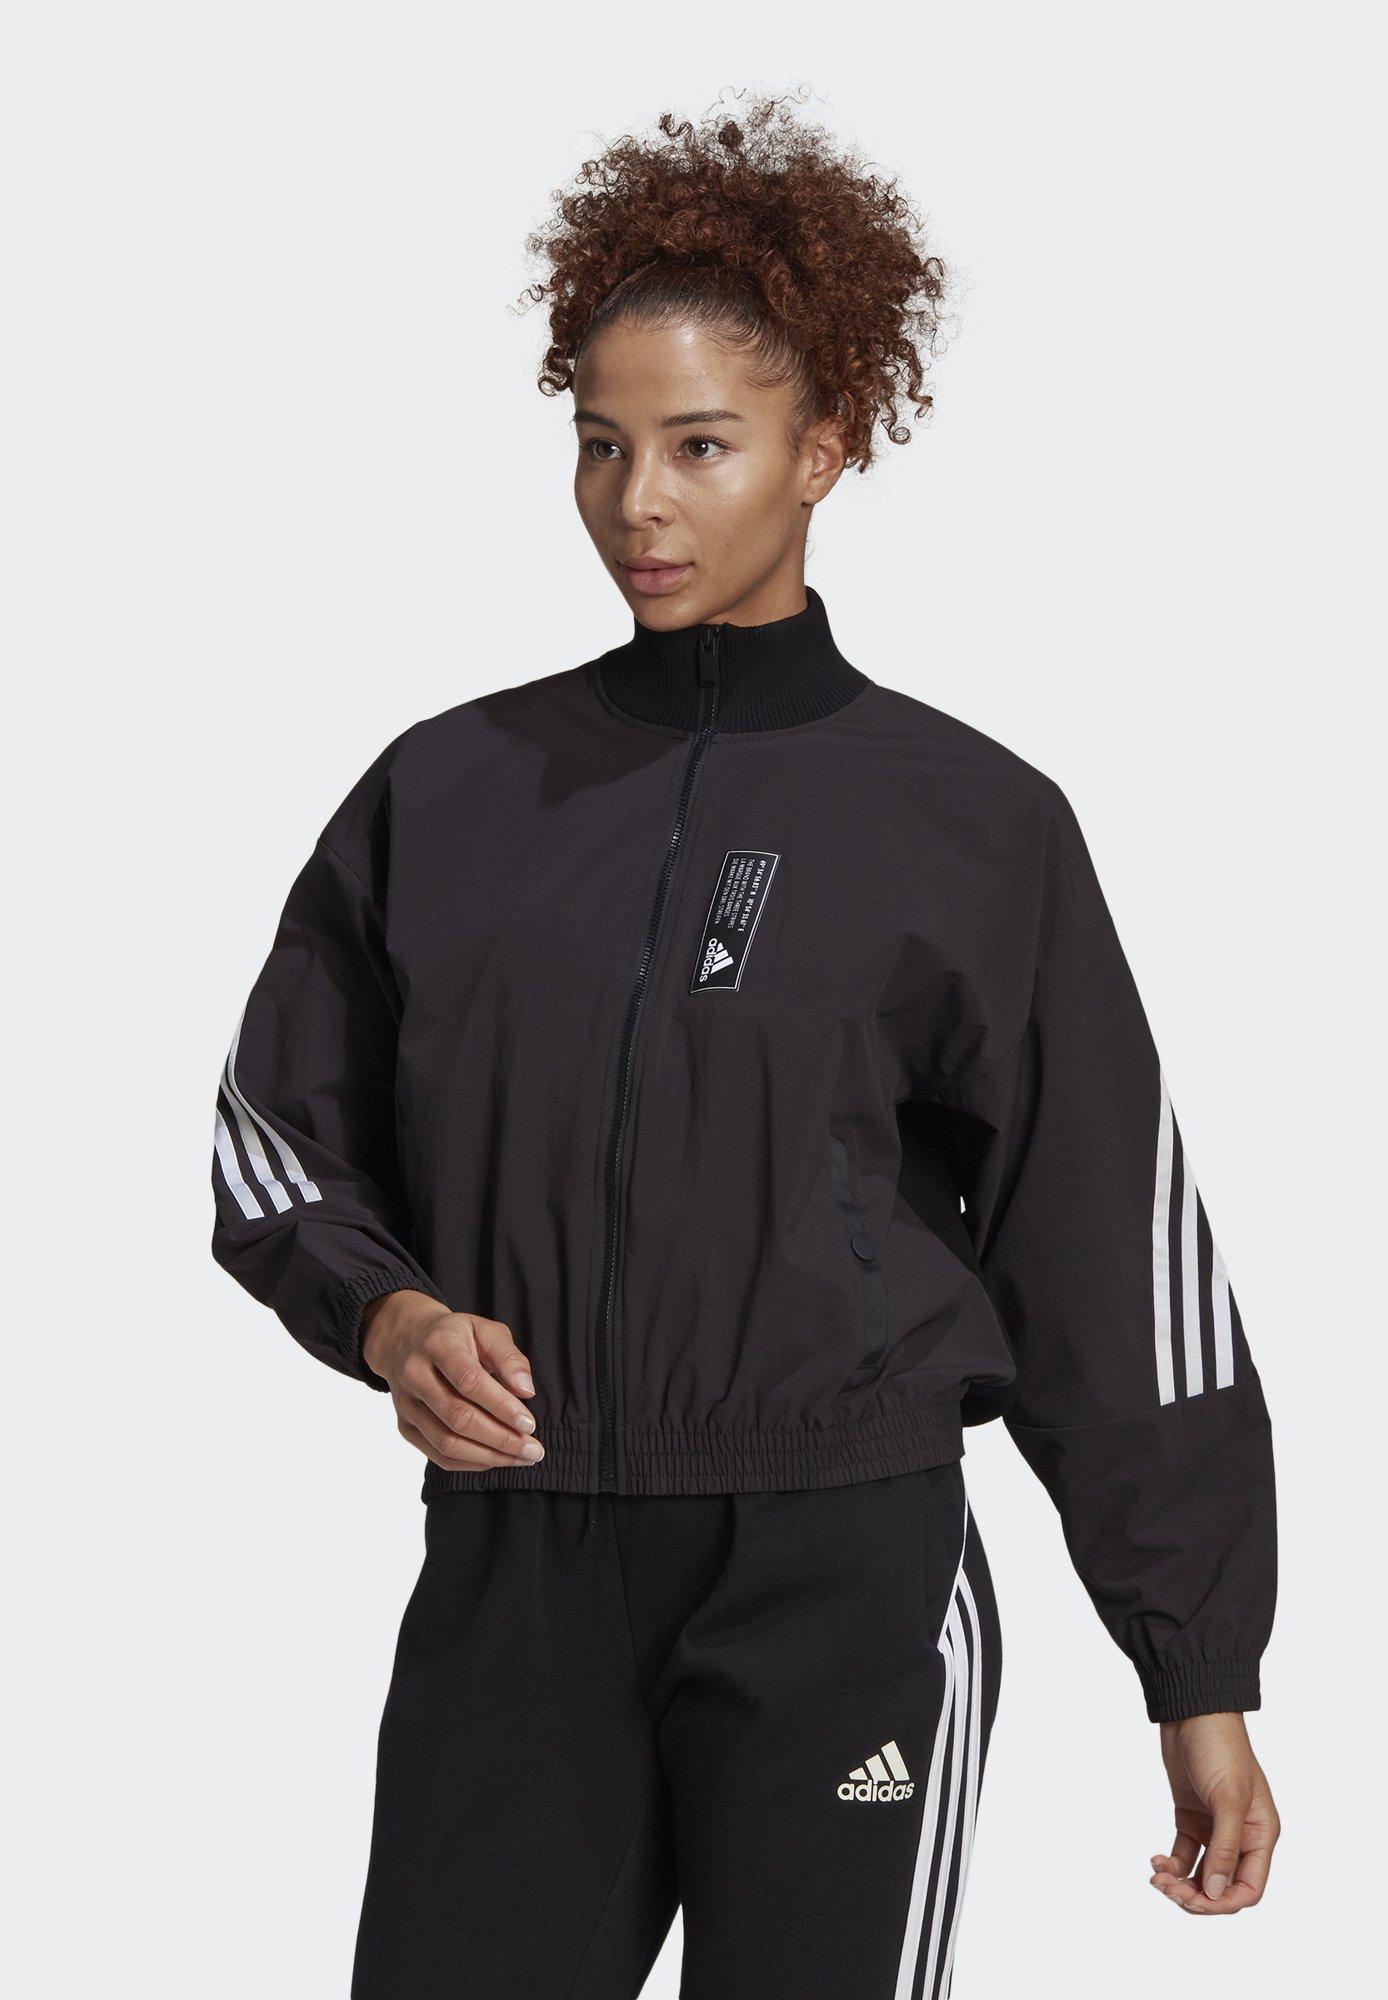 Women ADIDAS SPORTSWEAR AEROKNIT TRACK TOP - Training jacket